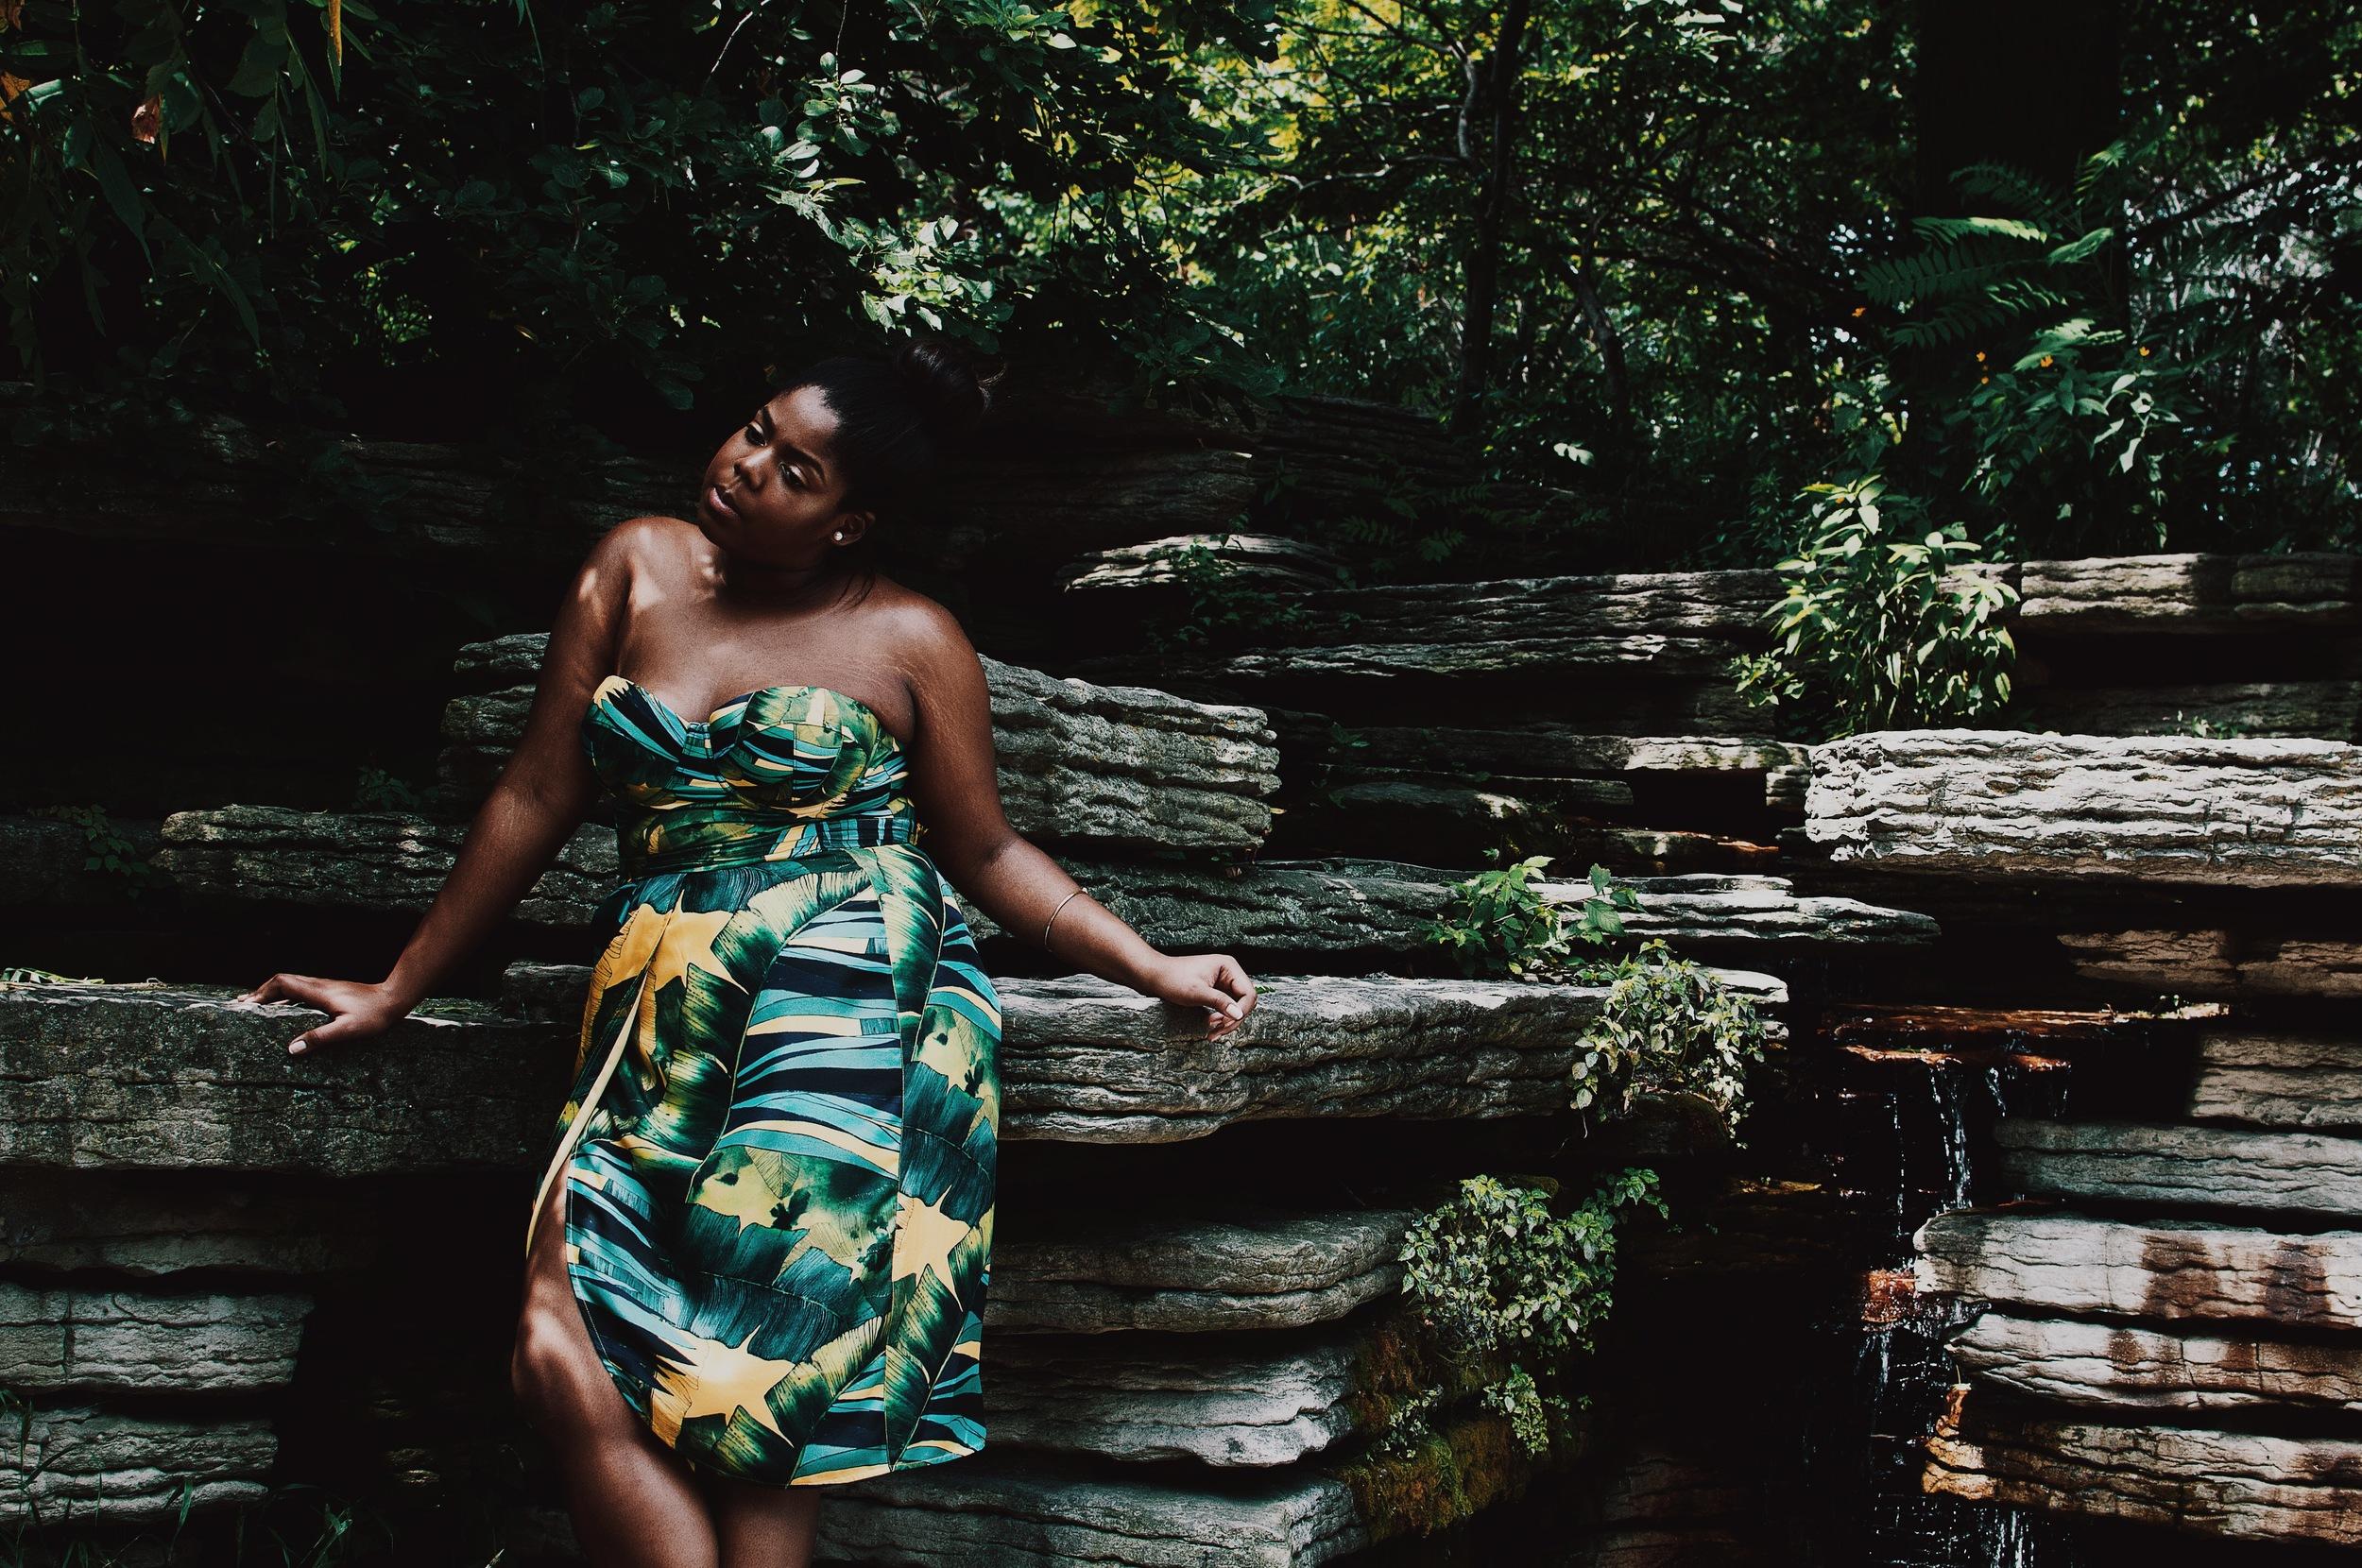 Jcrew Jungle Print Swimsuit Faux Tulip Wrap Skirt Double strap Heel Sandals Ikat Print Plus size Blogger Orne Jewelry Ghana THat Hayet Rida 5.jpeg